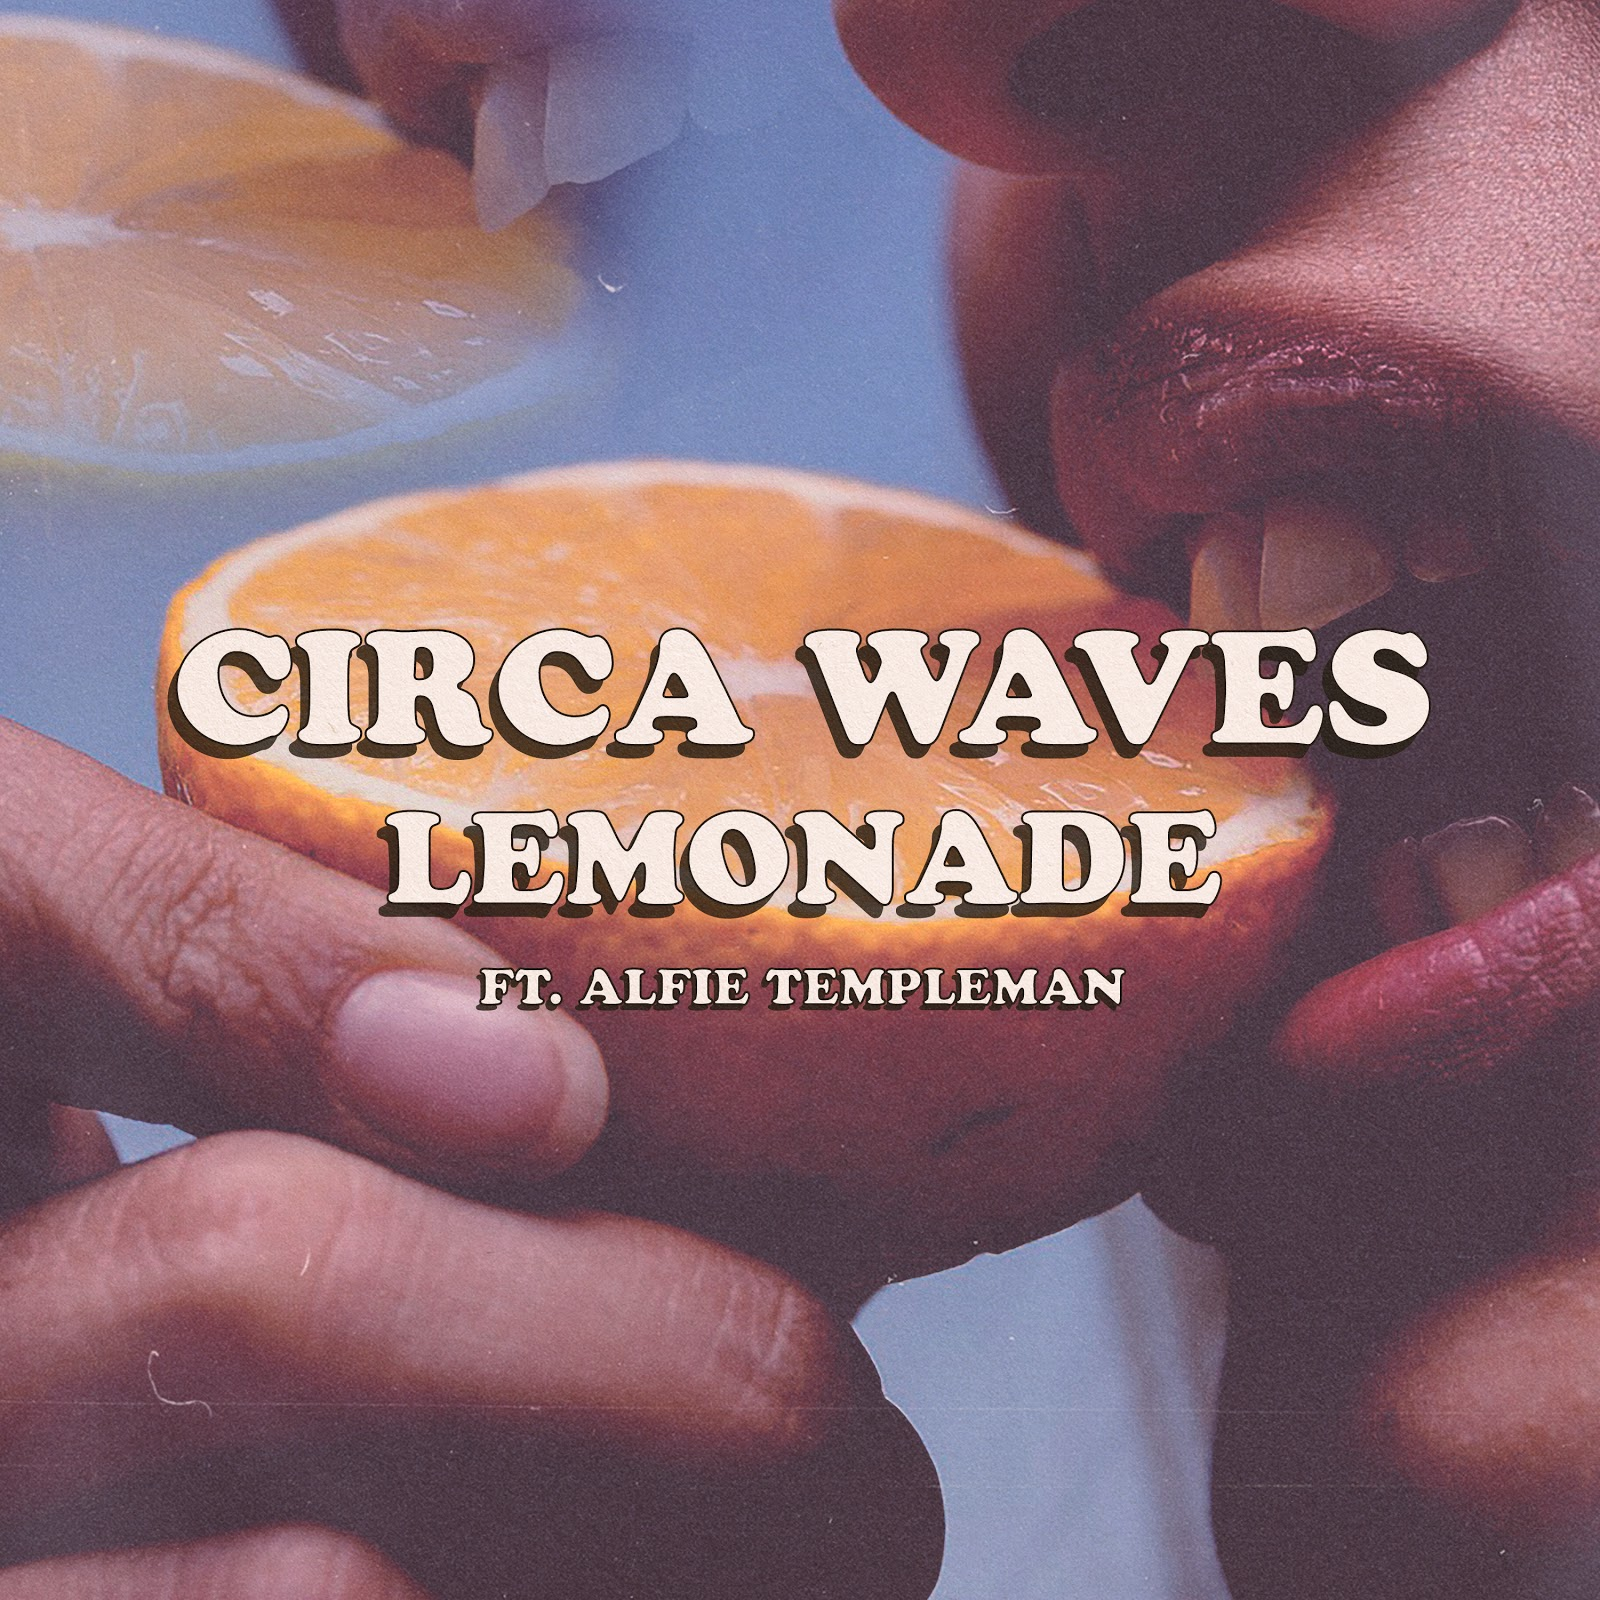 Circa Waves Enlist Alfie Templeman On New Single 'Lemonade'